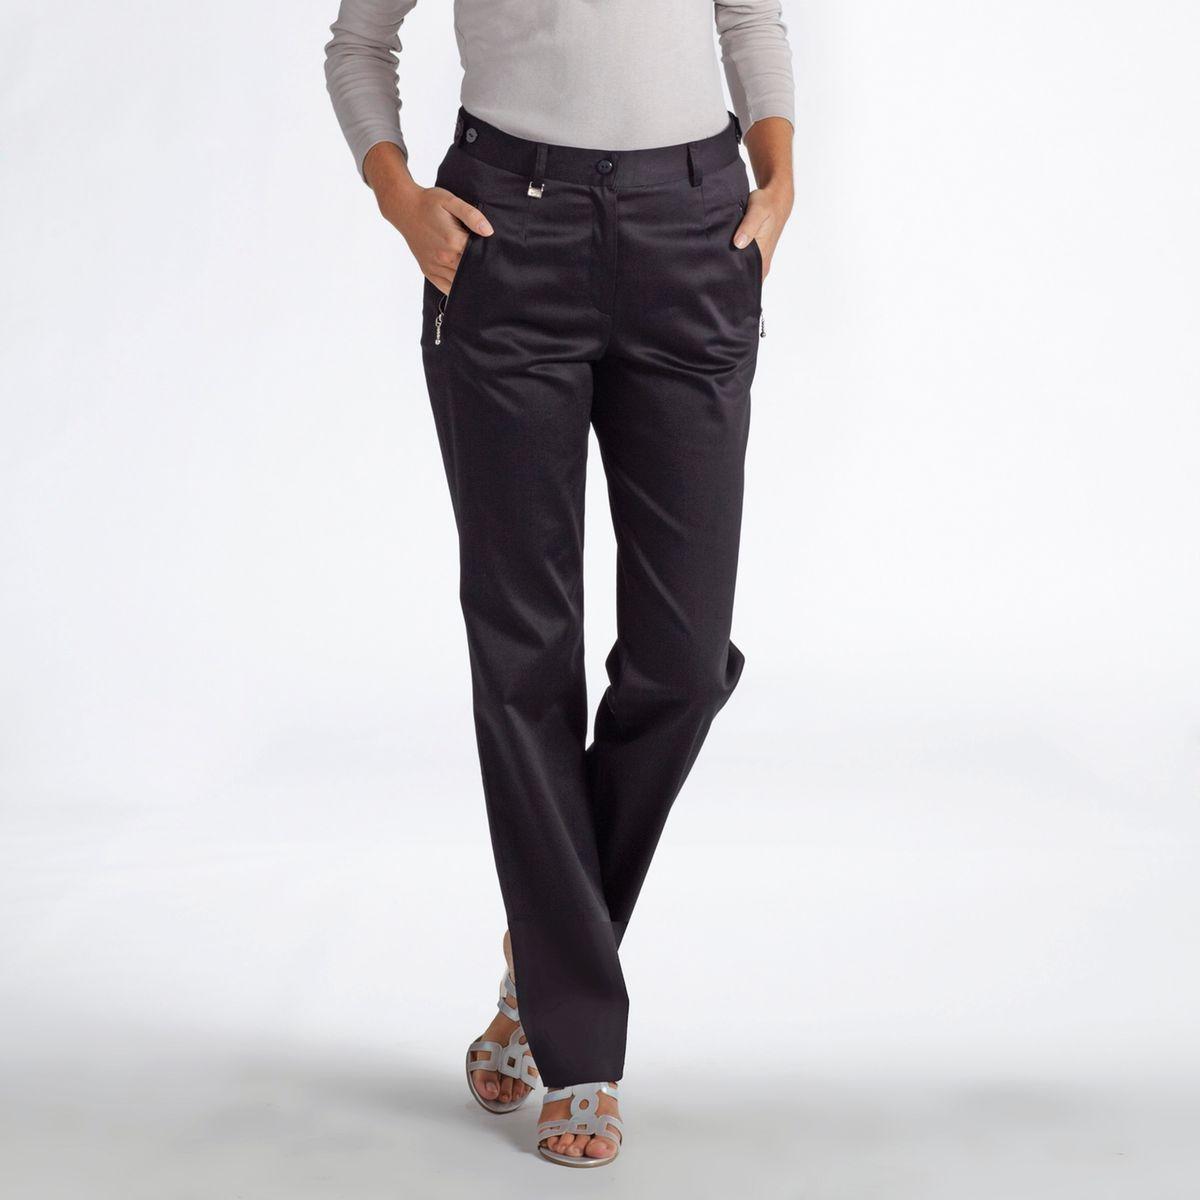 Pantalon spécial voyage, satin de coton stretch